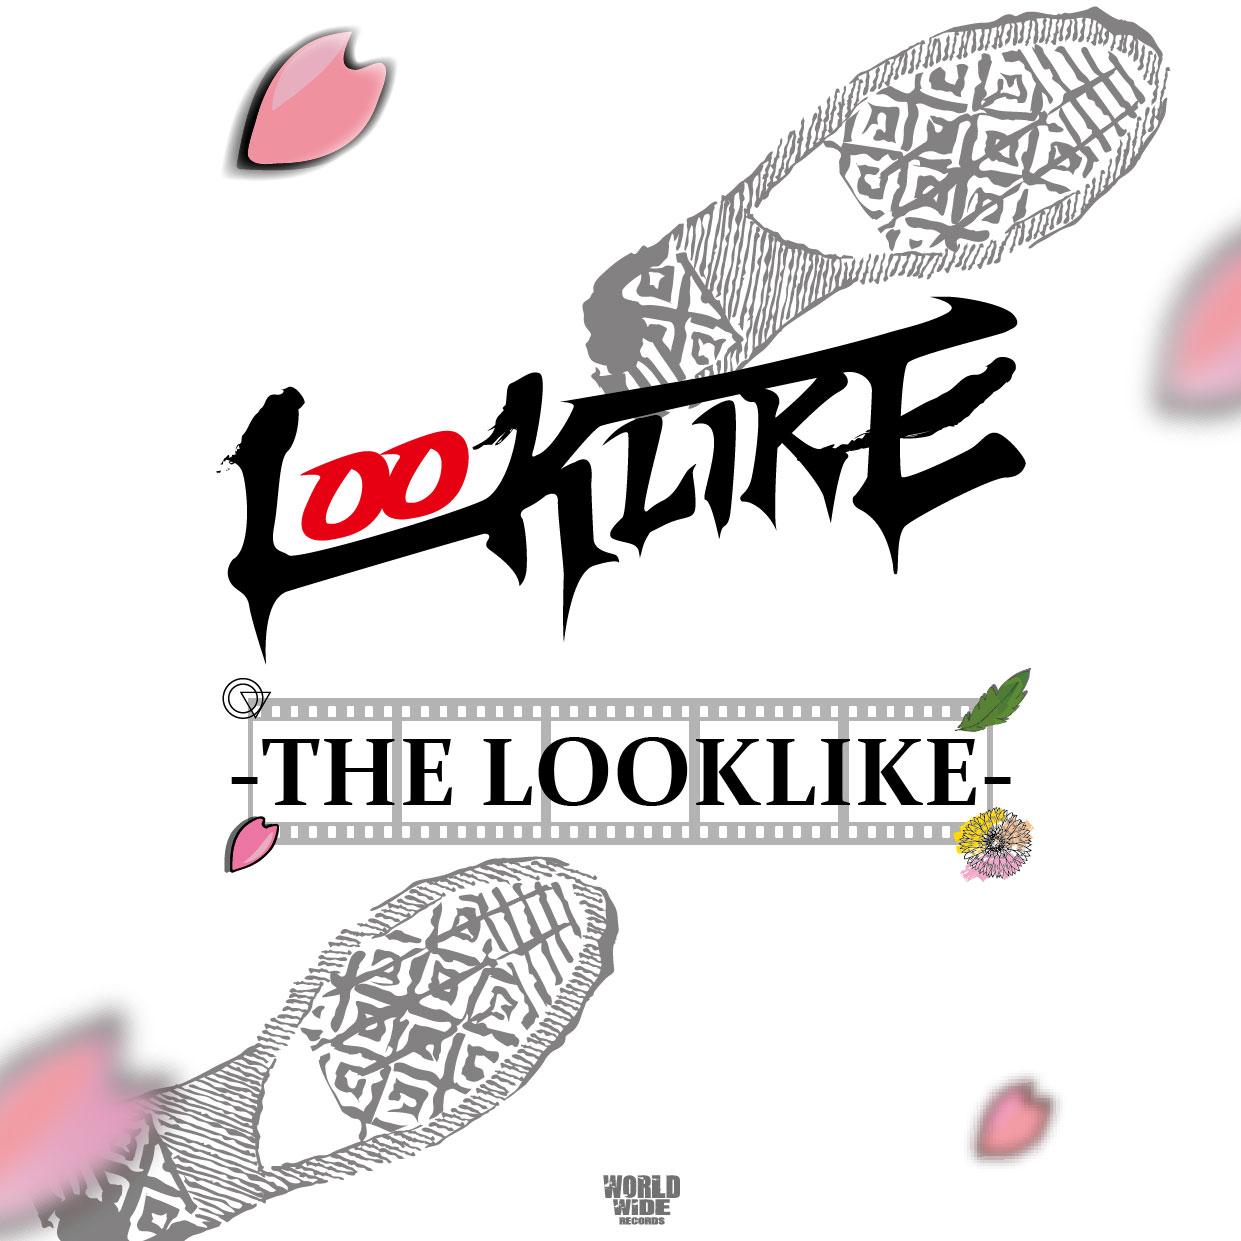 THE LOOKLIKE